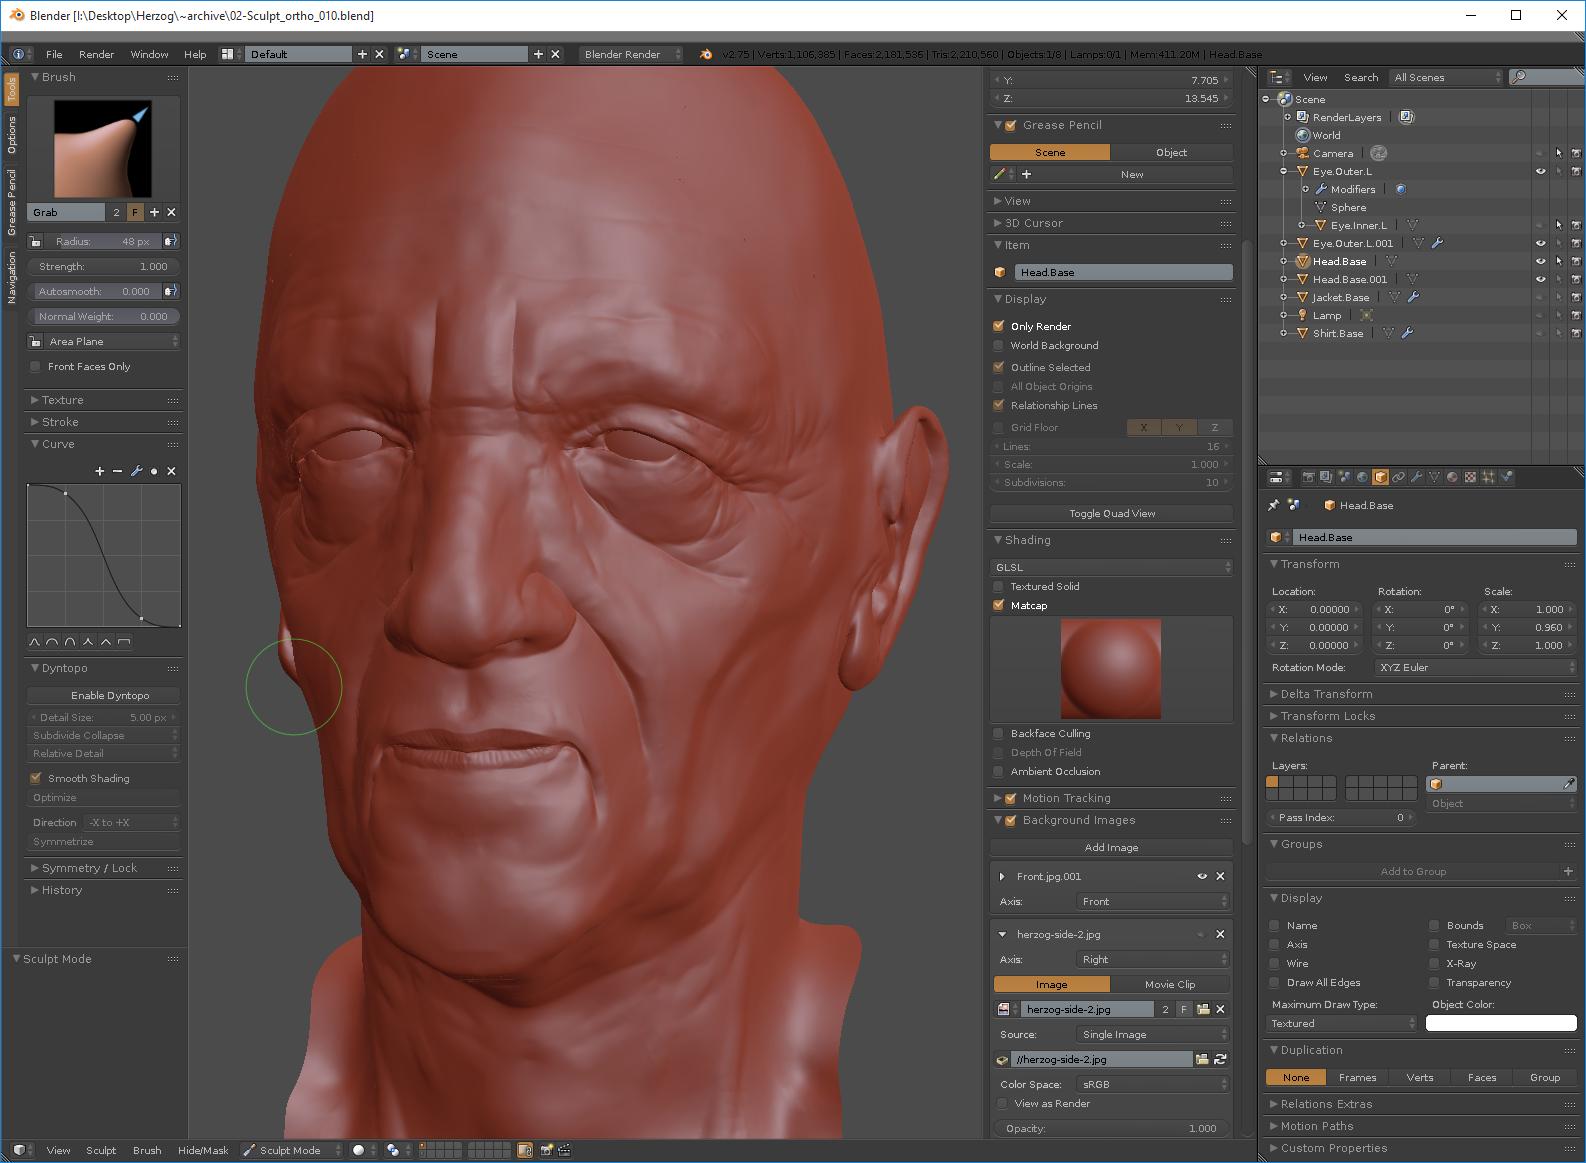 Symmetrical Dynamic Topology sculpting in Blender.